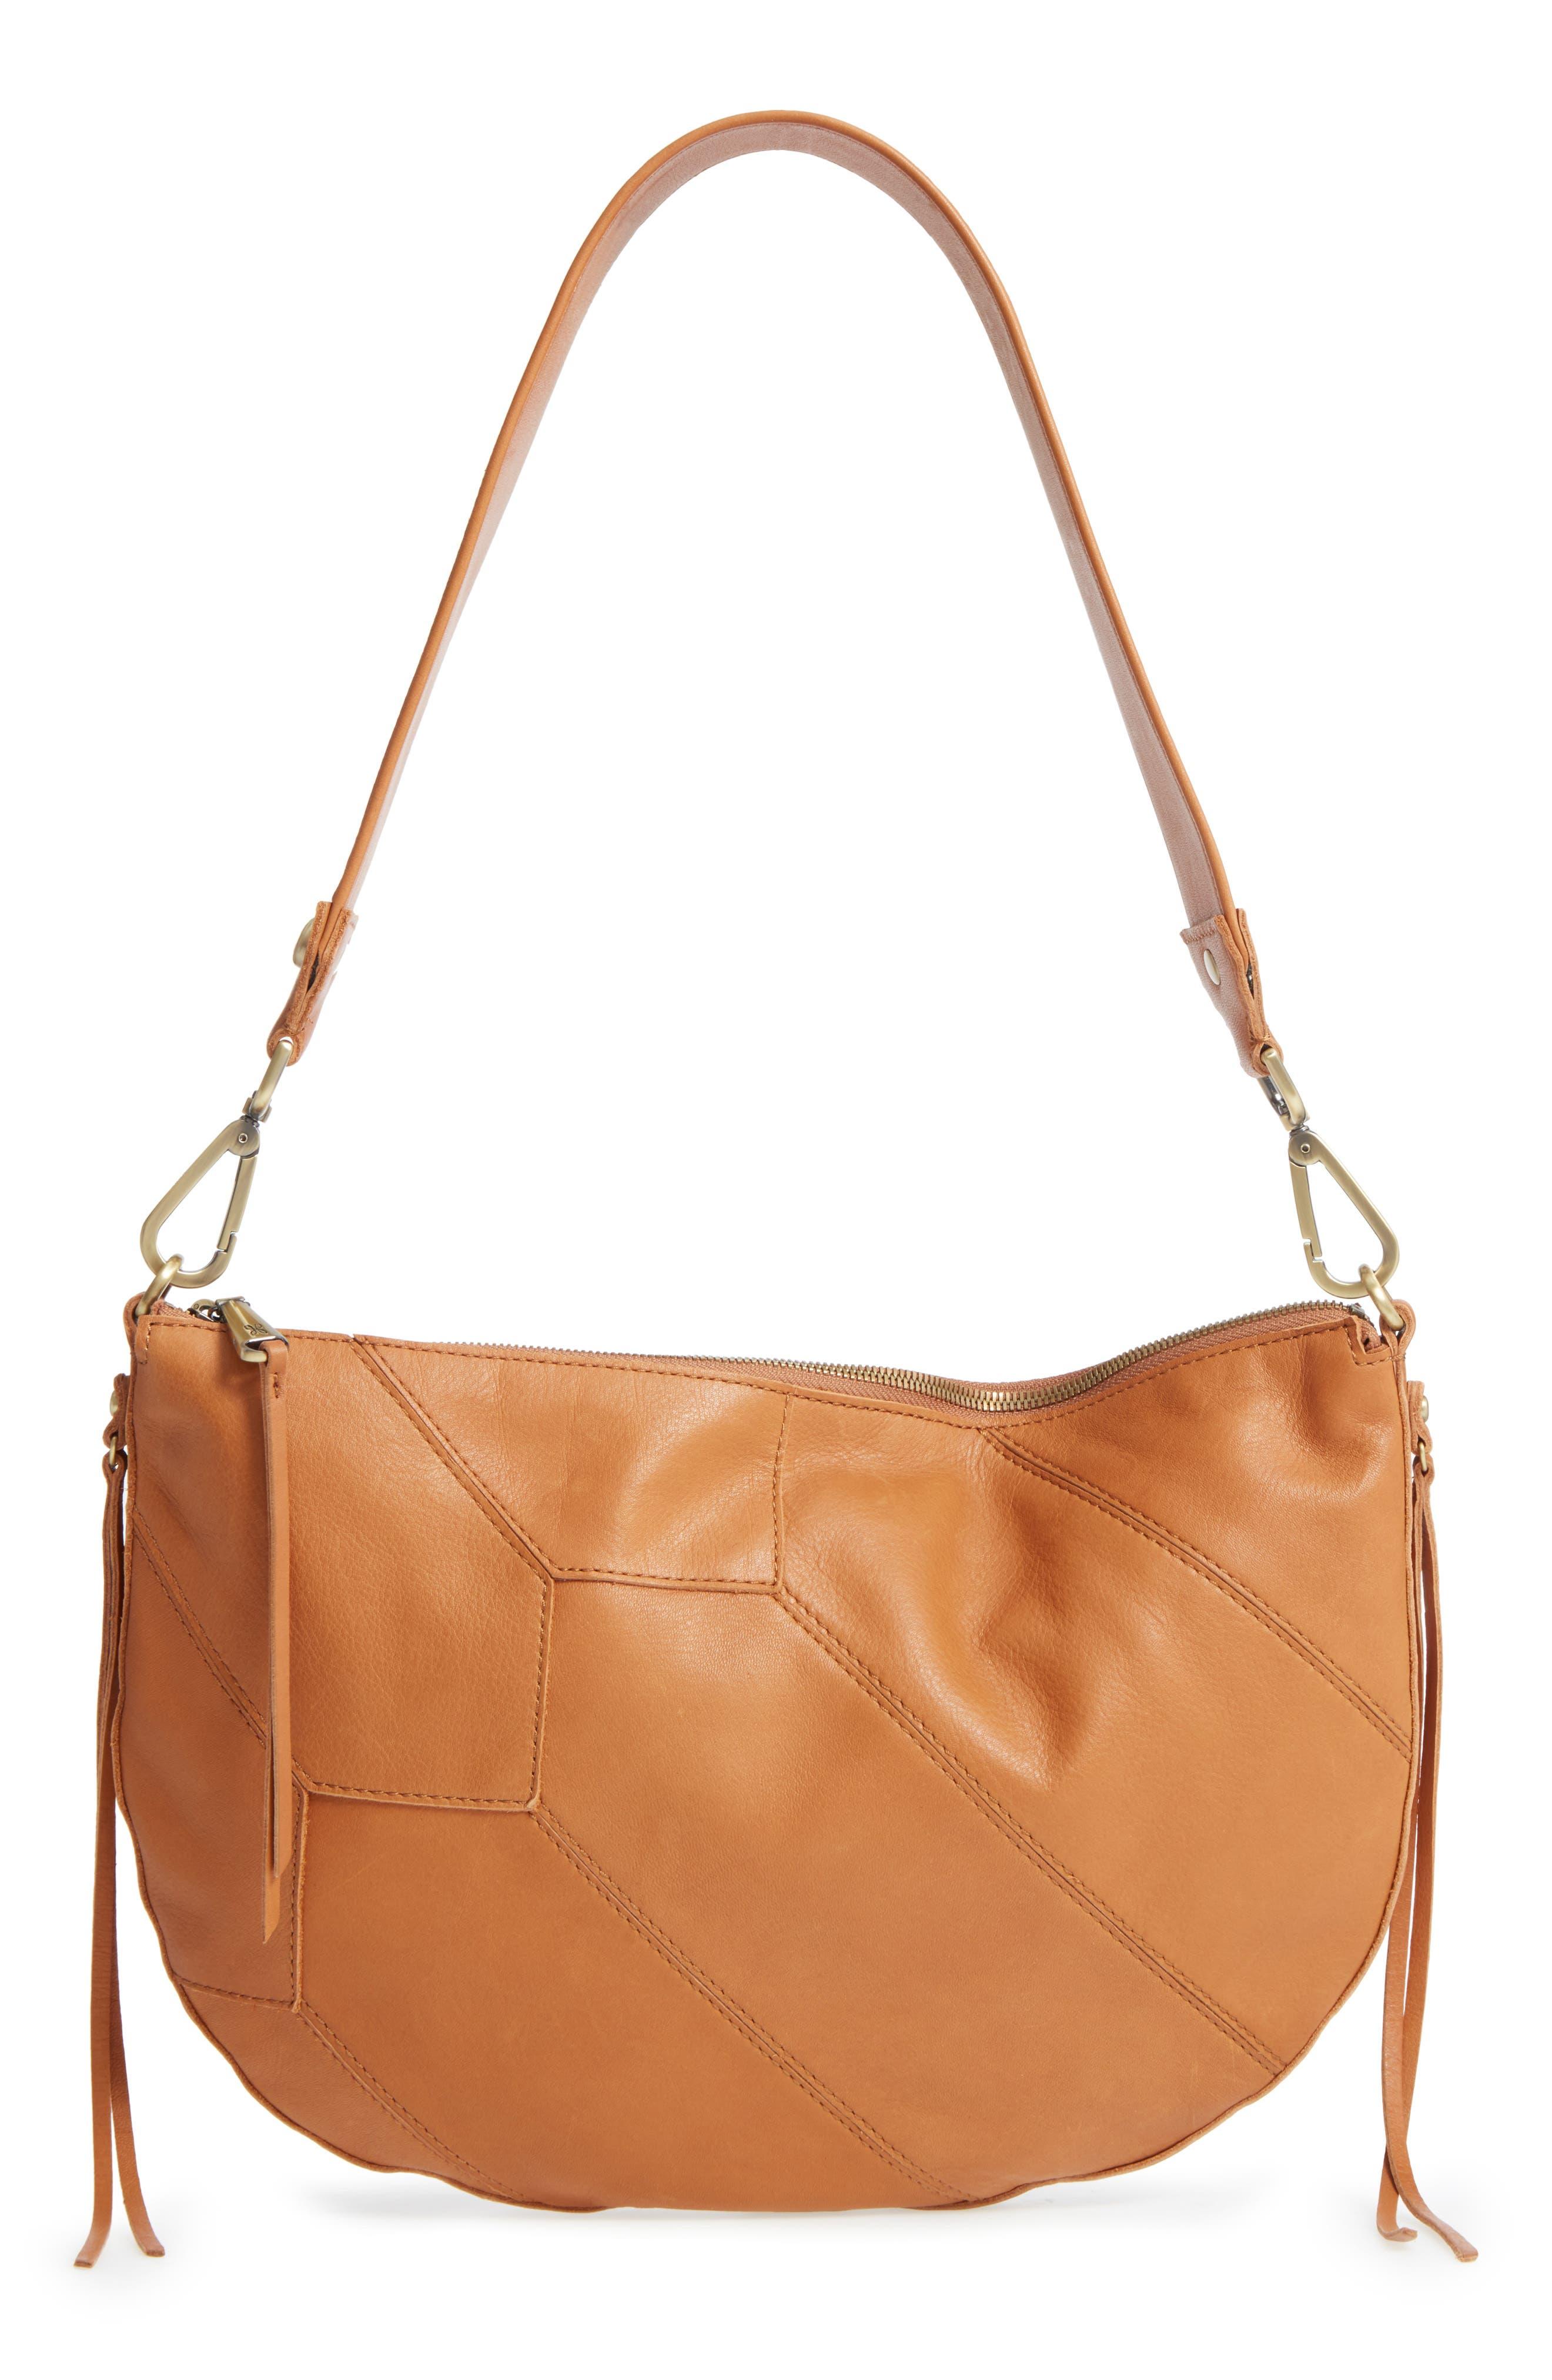 Cisco Calfskin Leather Hobo Bag,                             Main thumbnail 1, color,                             200